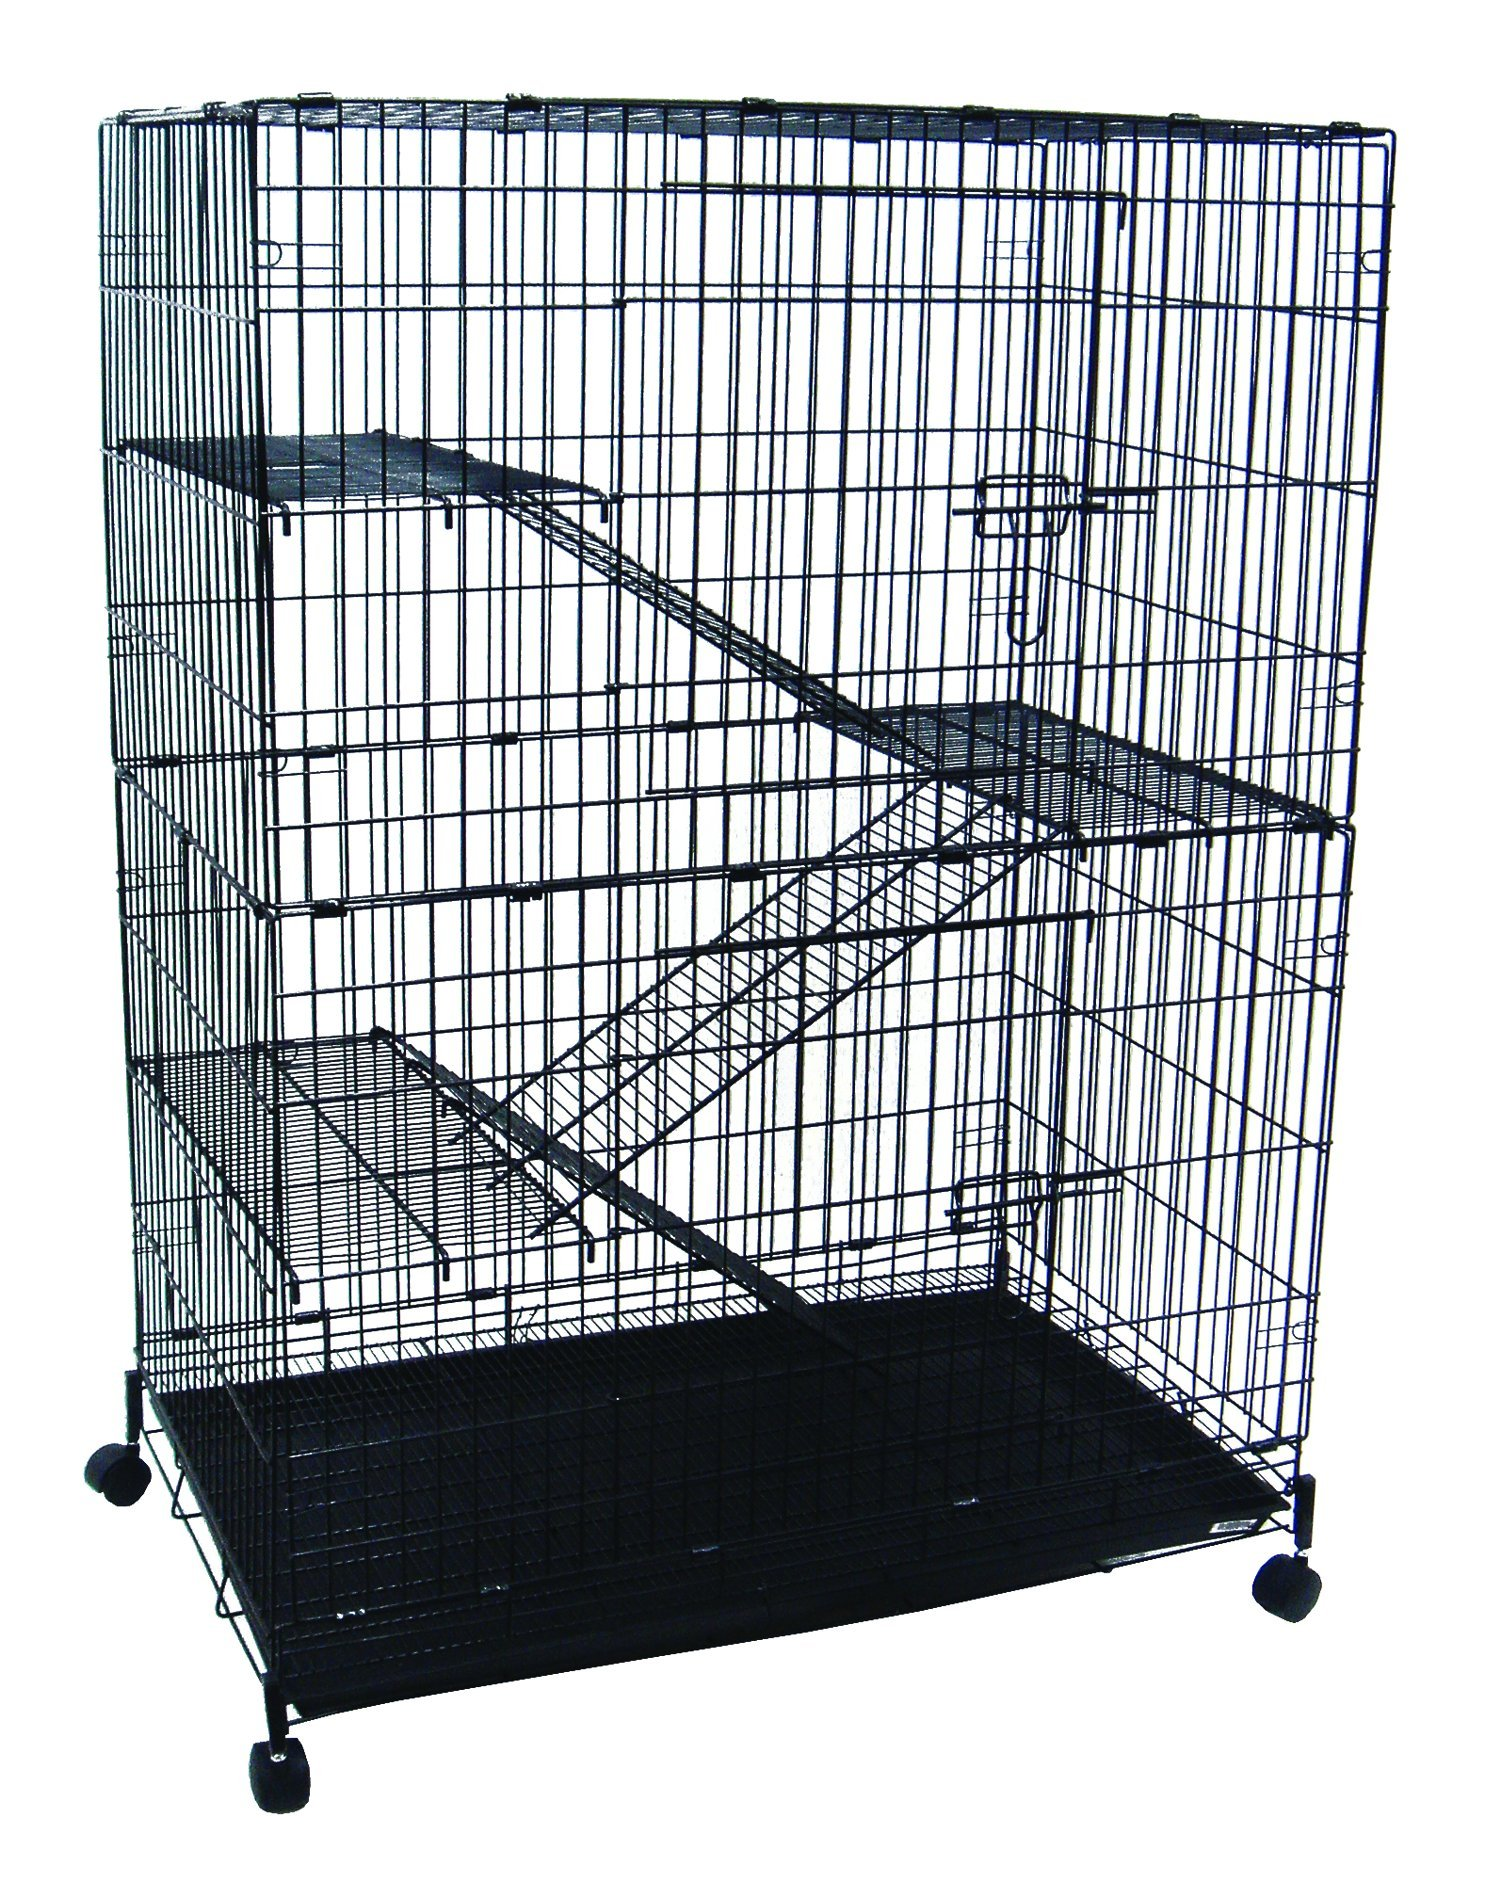 YML 4-Level Small Animal Chichilla Cat Ferret Cage, Black by YML